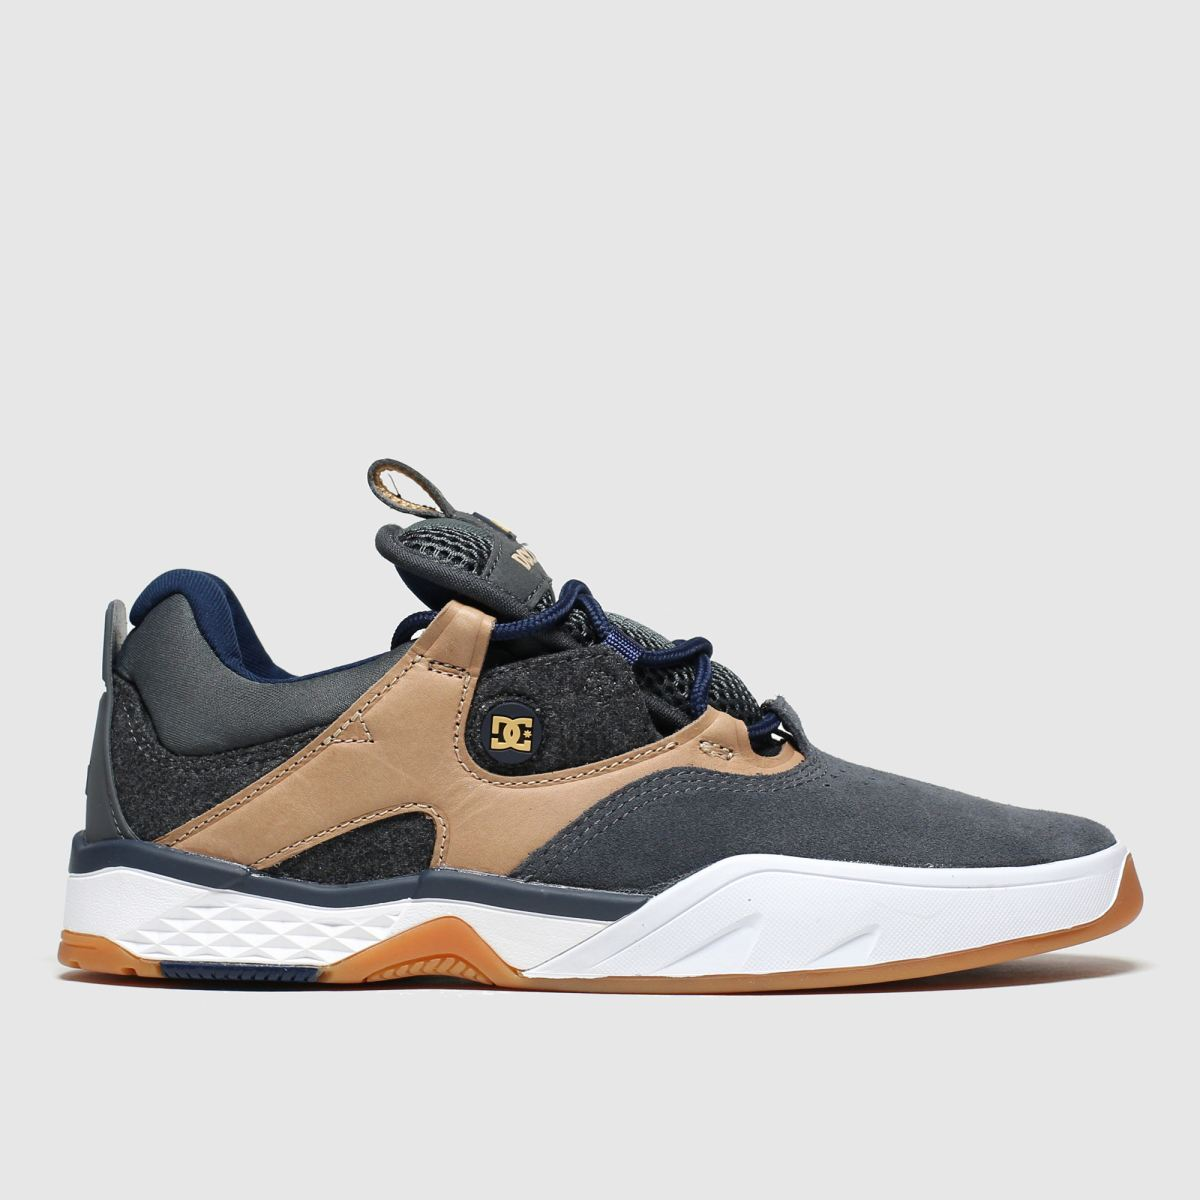 dc shoes Dc Shoes Black & Brown Kalis Trainers